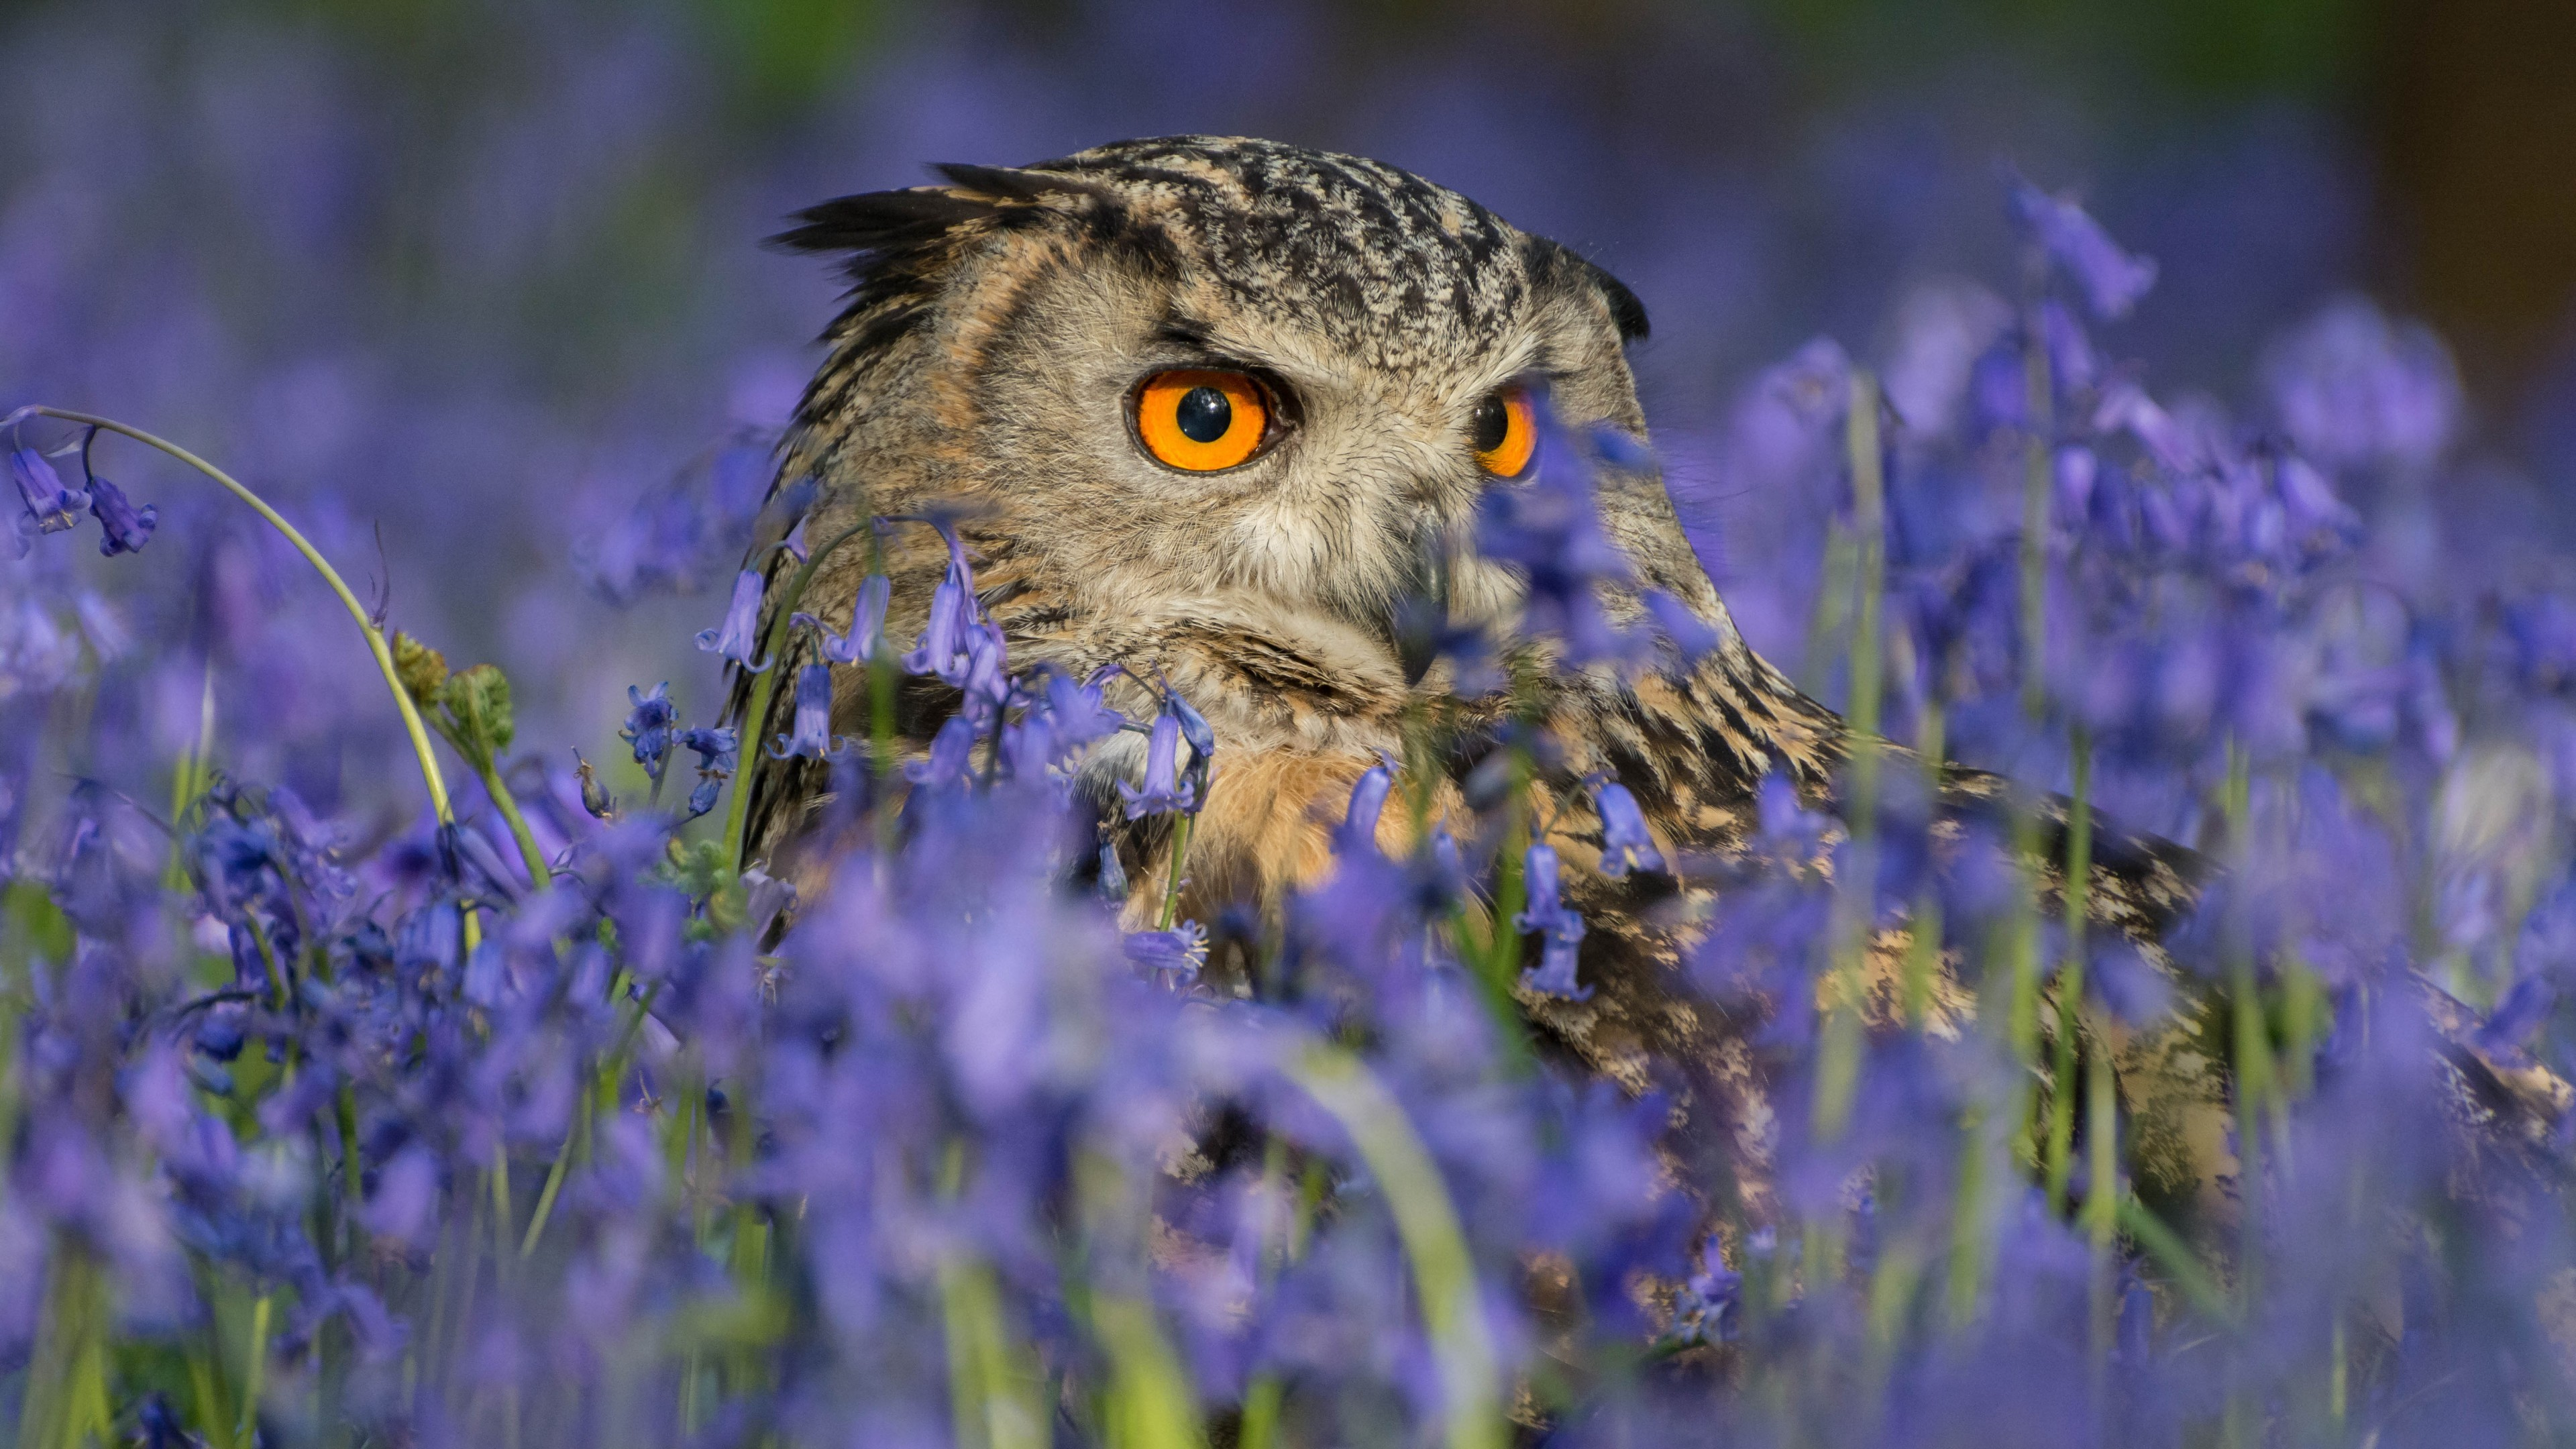 Res: 3840x2160, Animals / Owl Wallpaper